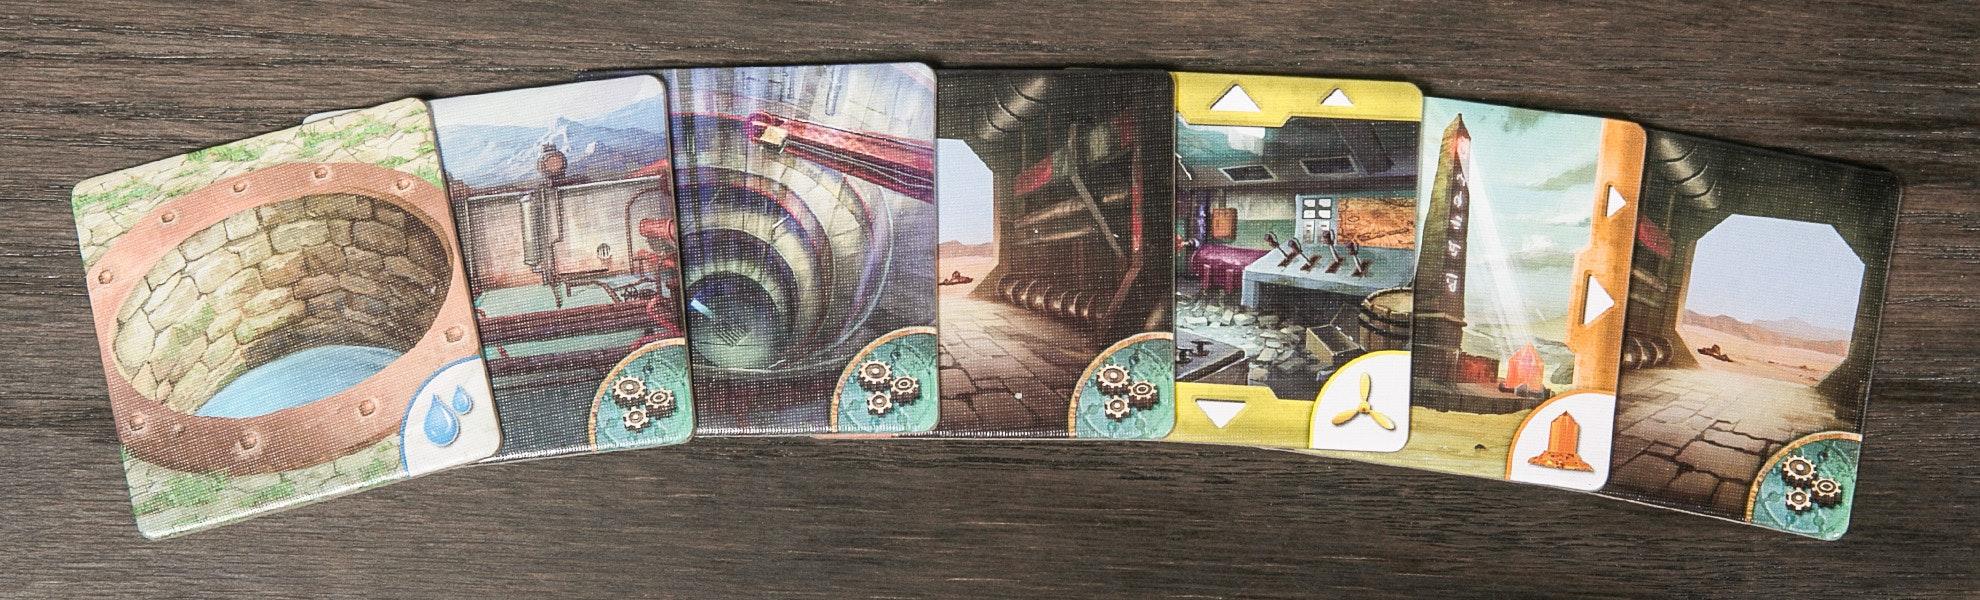 Massdrop Cooperative Games Bundle